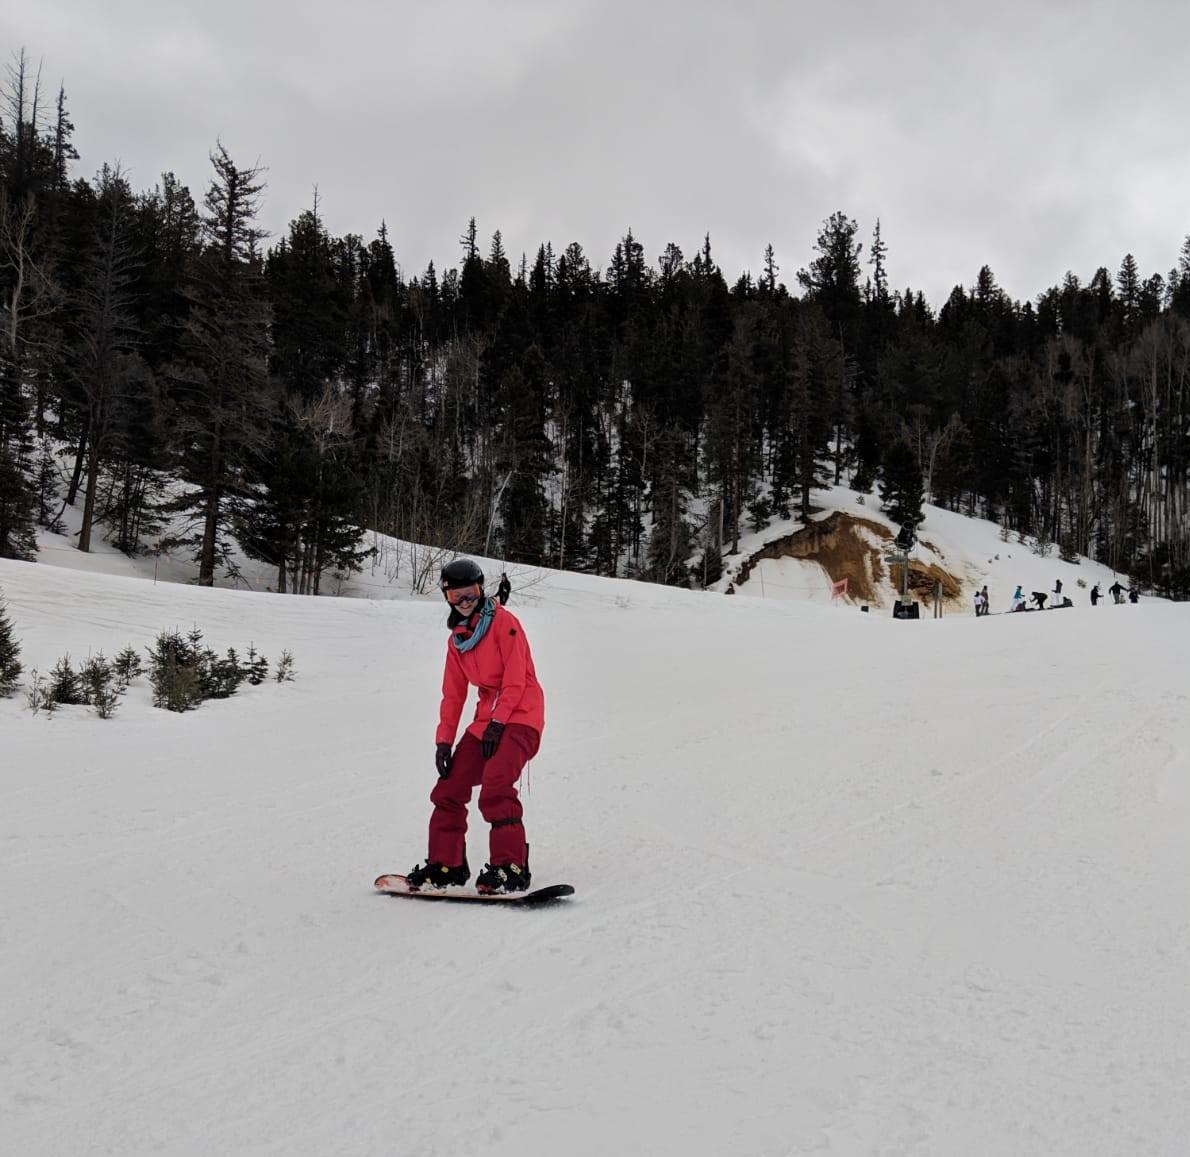 snowboarding2.jpg